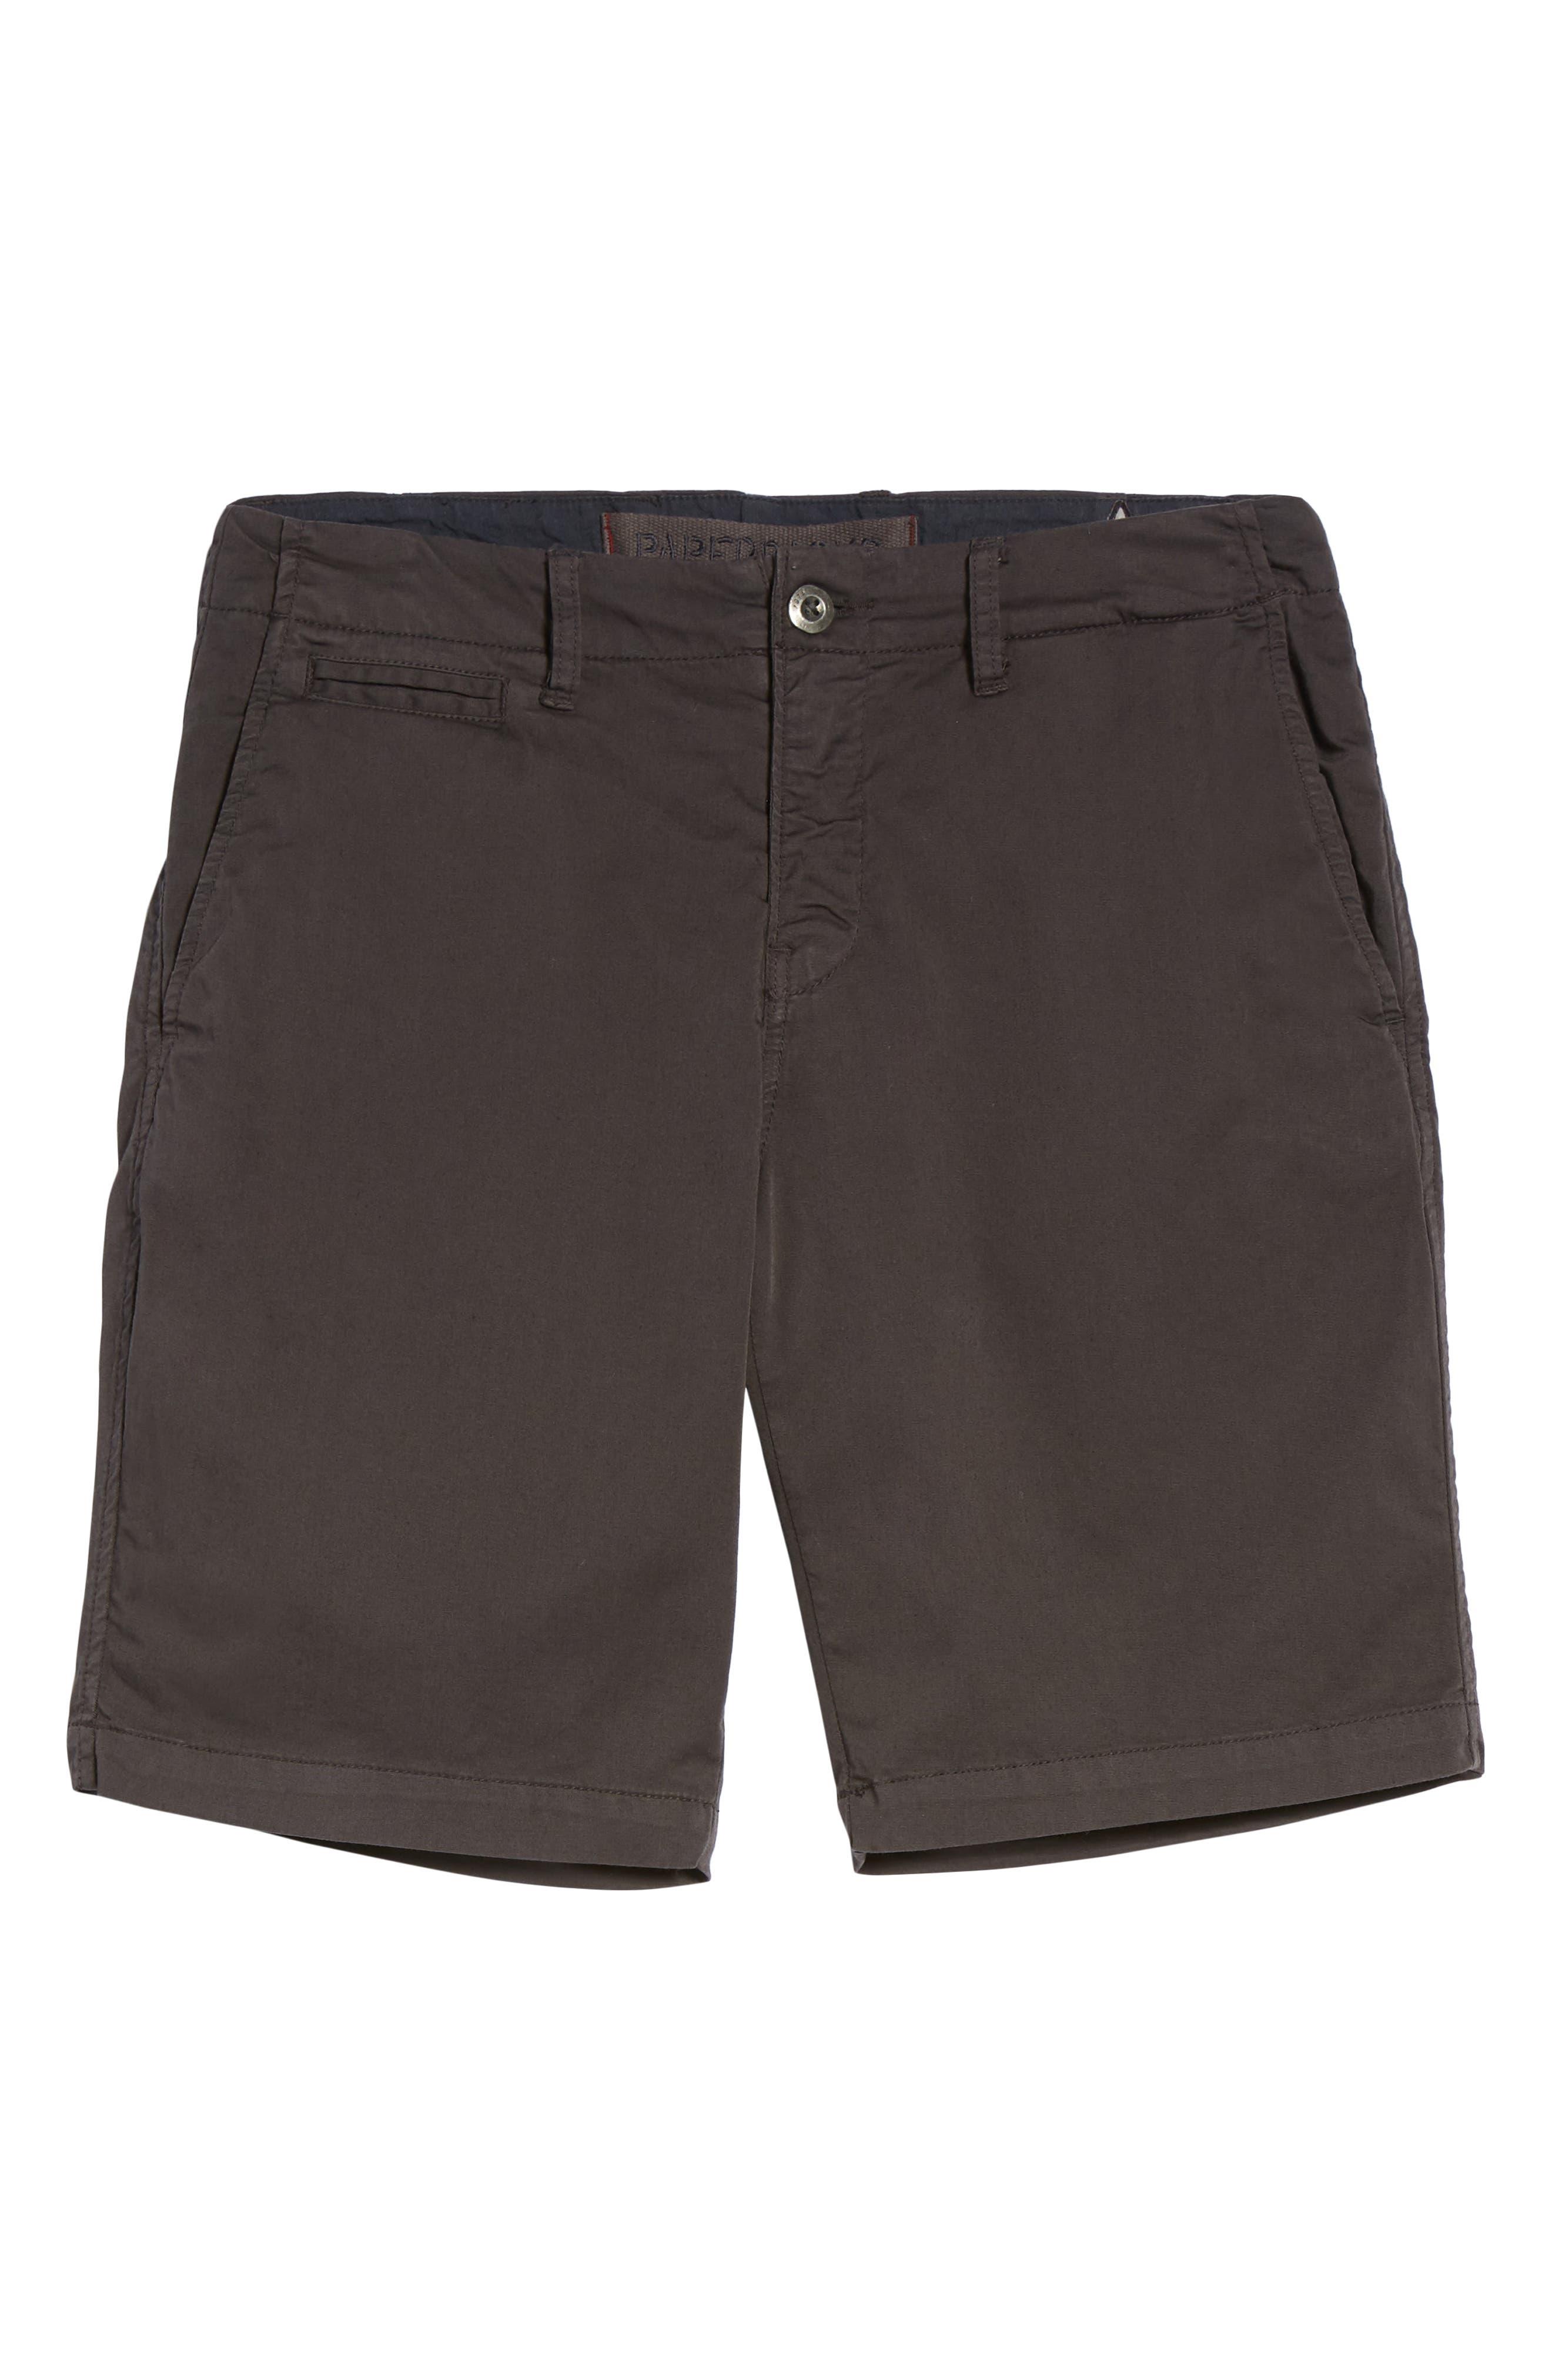 St. Barts Twill Shorts,                             Alternate thumbnail 62, color,